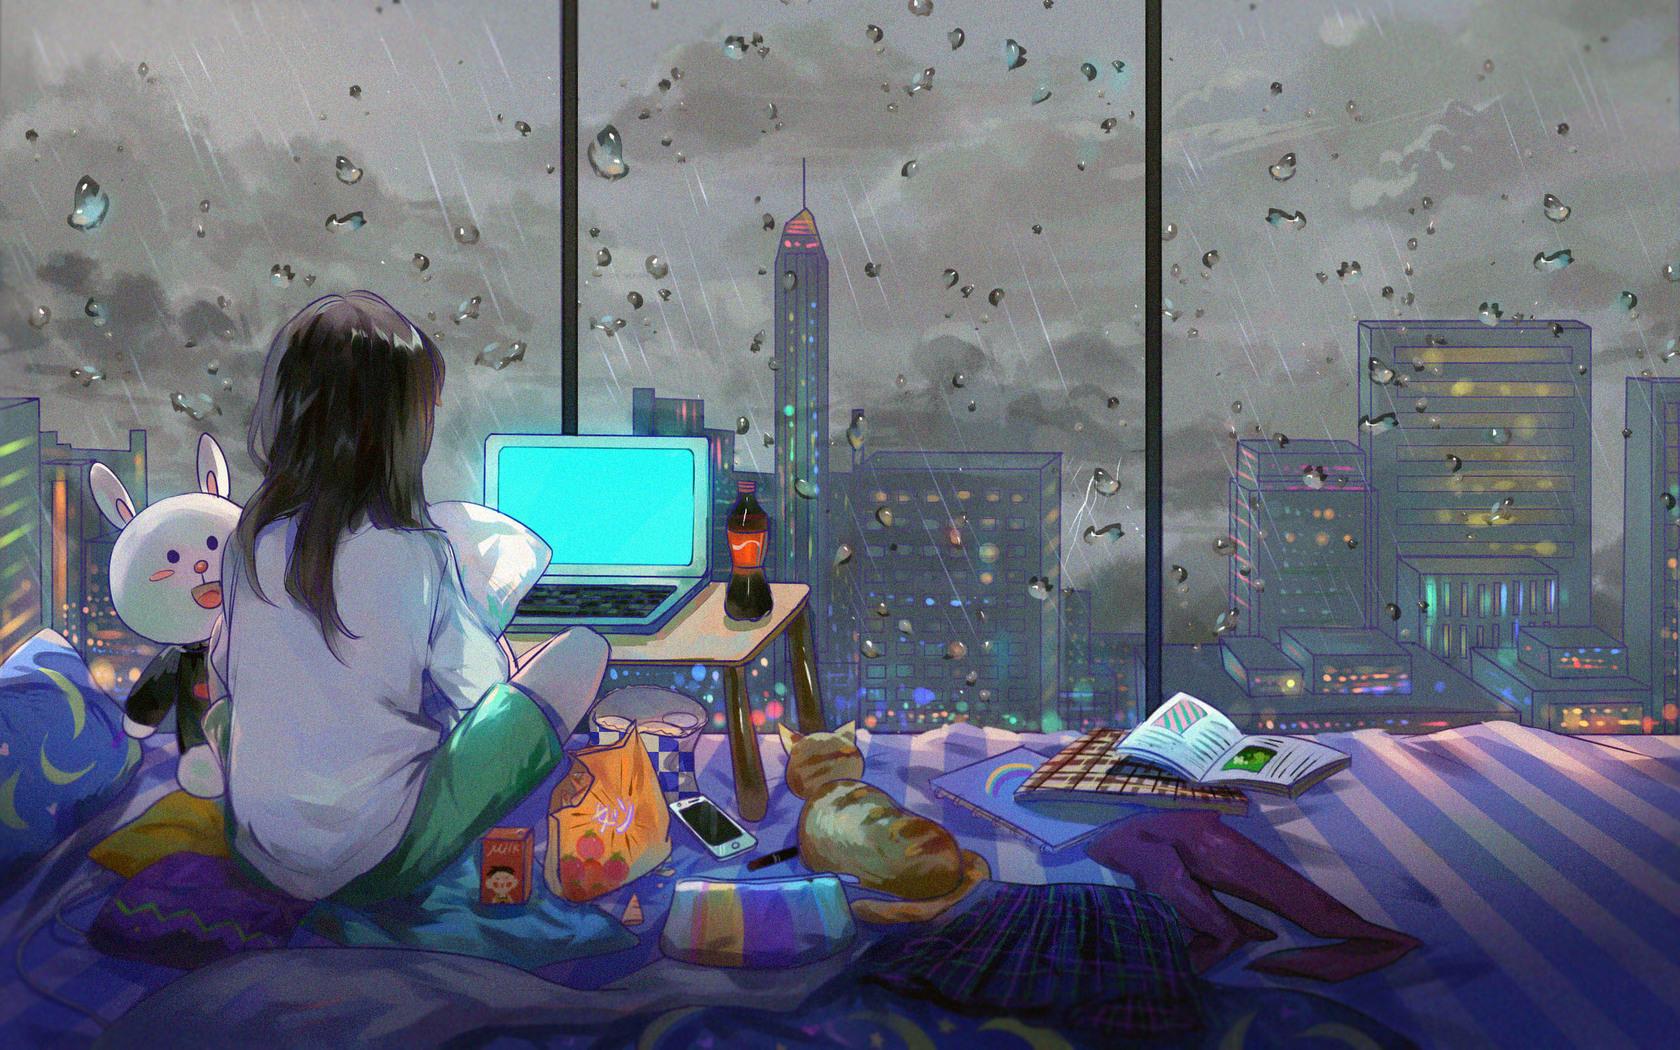 1680x1050 Anime Girl Room City Cat 1680x1050 Resolution HD ...